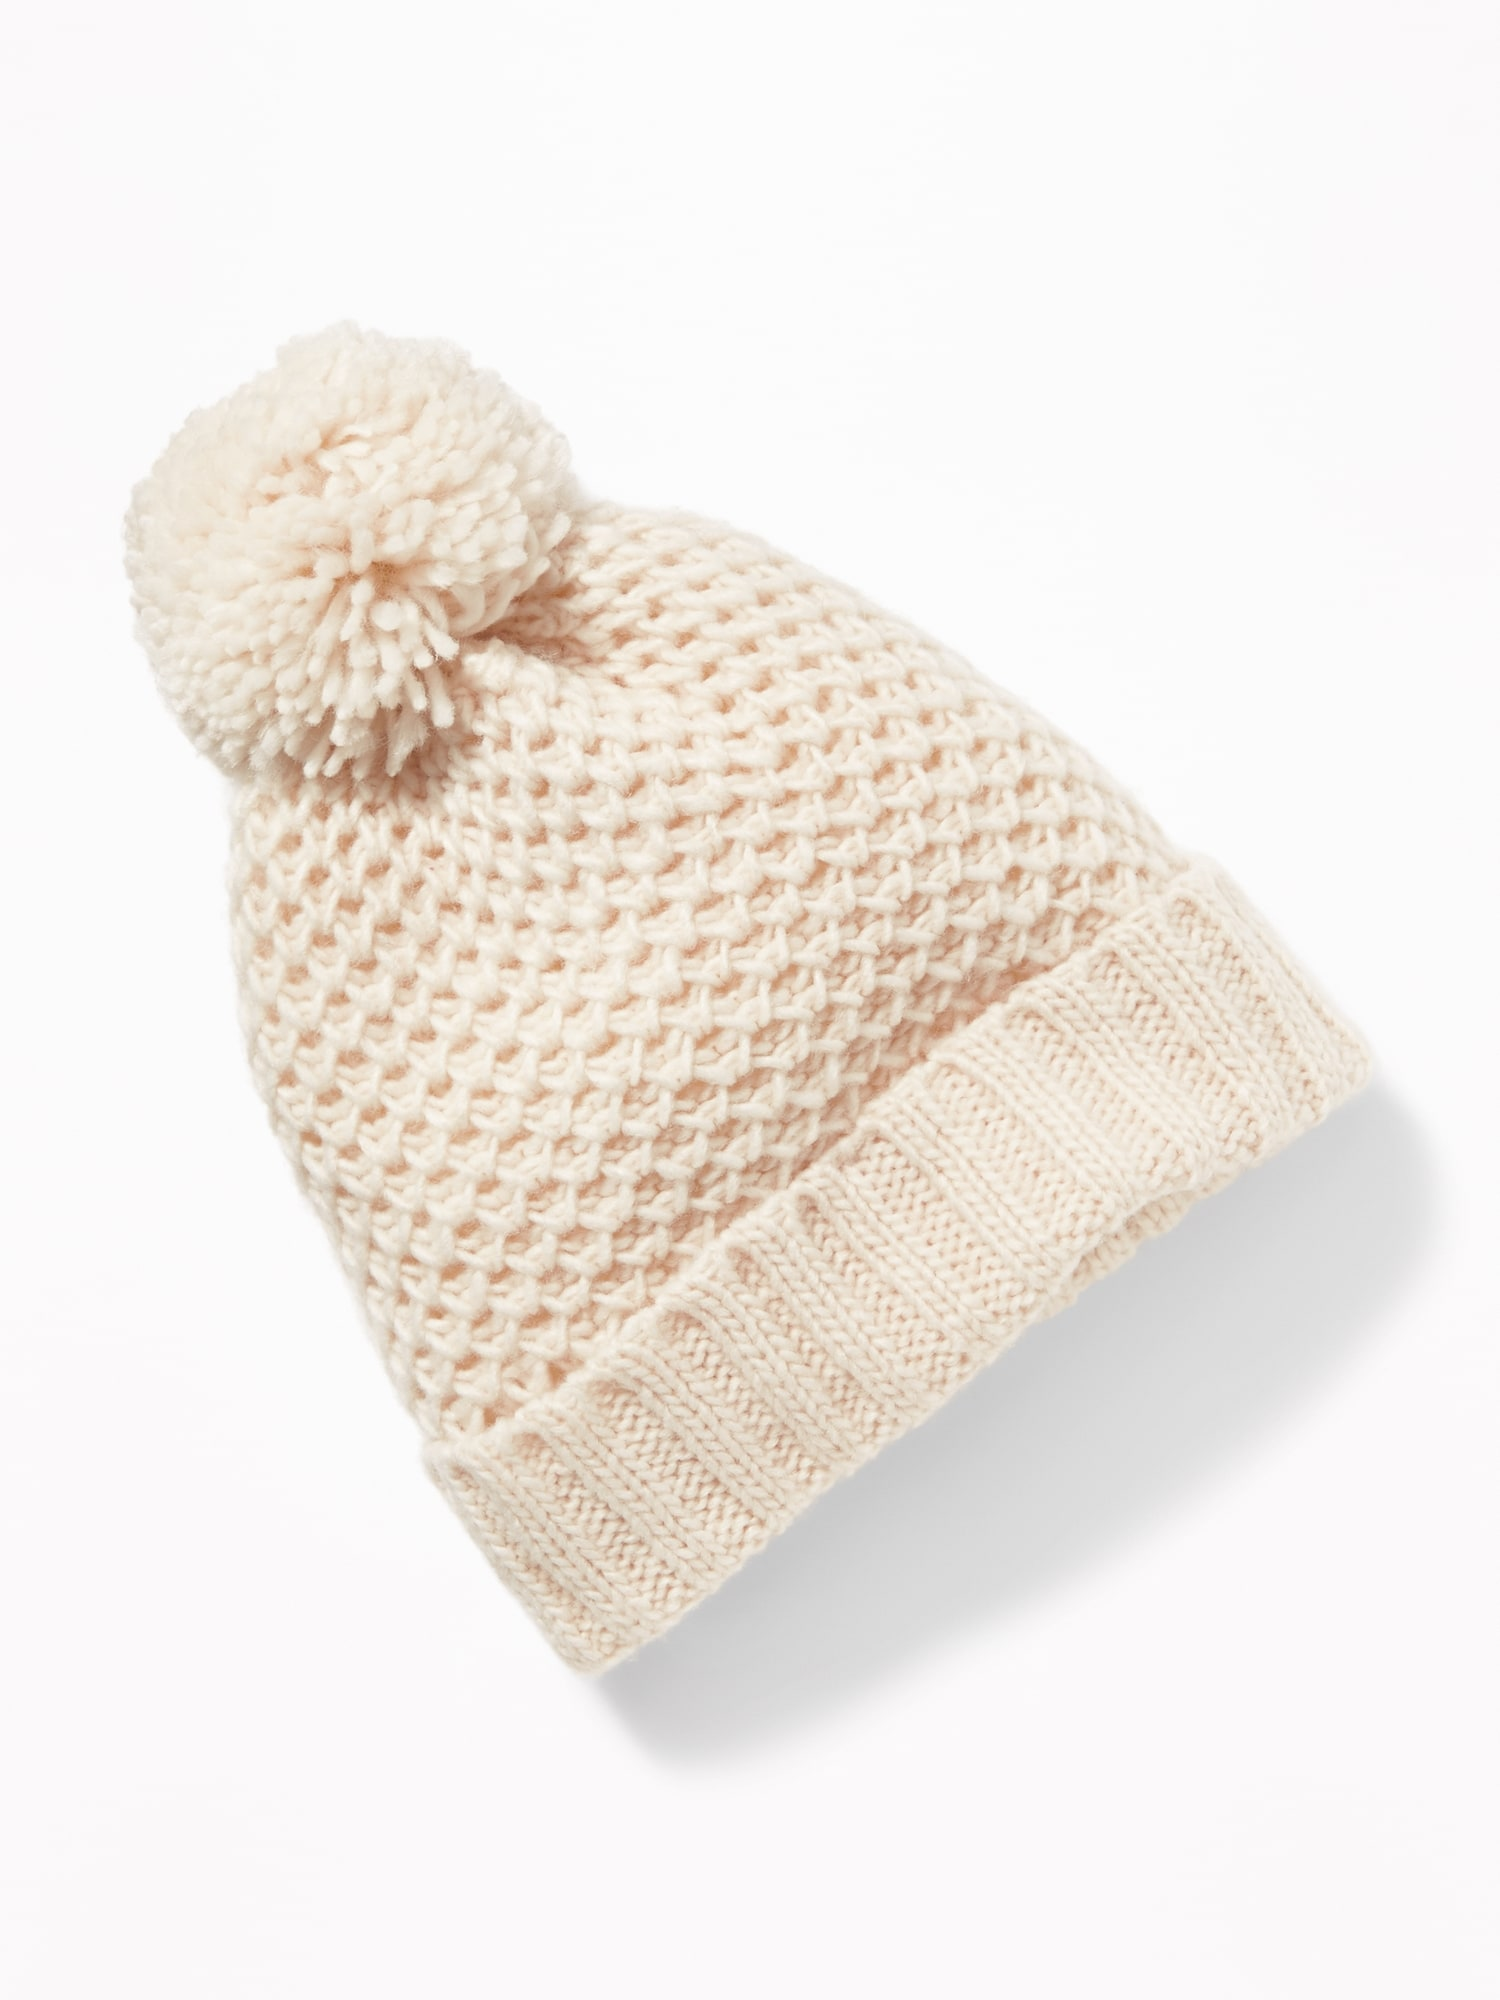 Honeycomb-Knit Pom-Pom Beanie for Baby  e3a025ee1b19